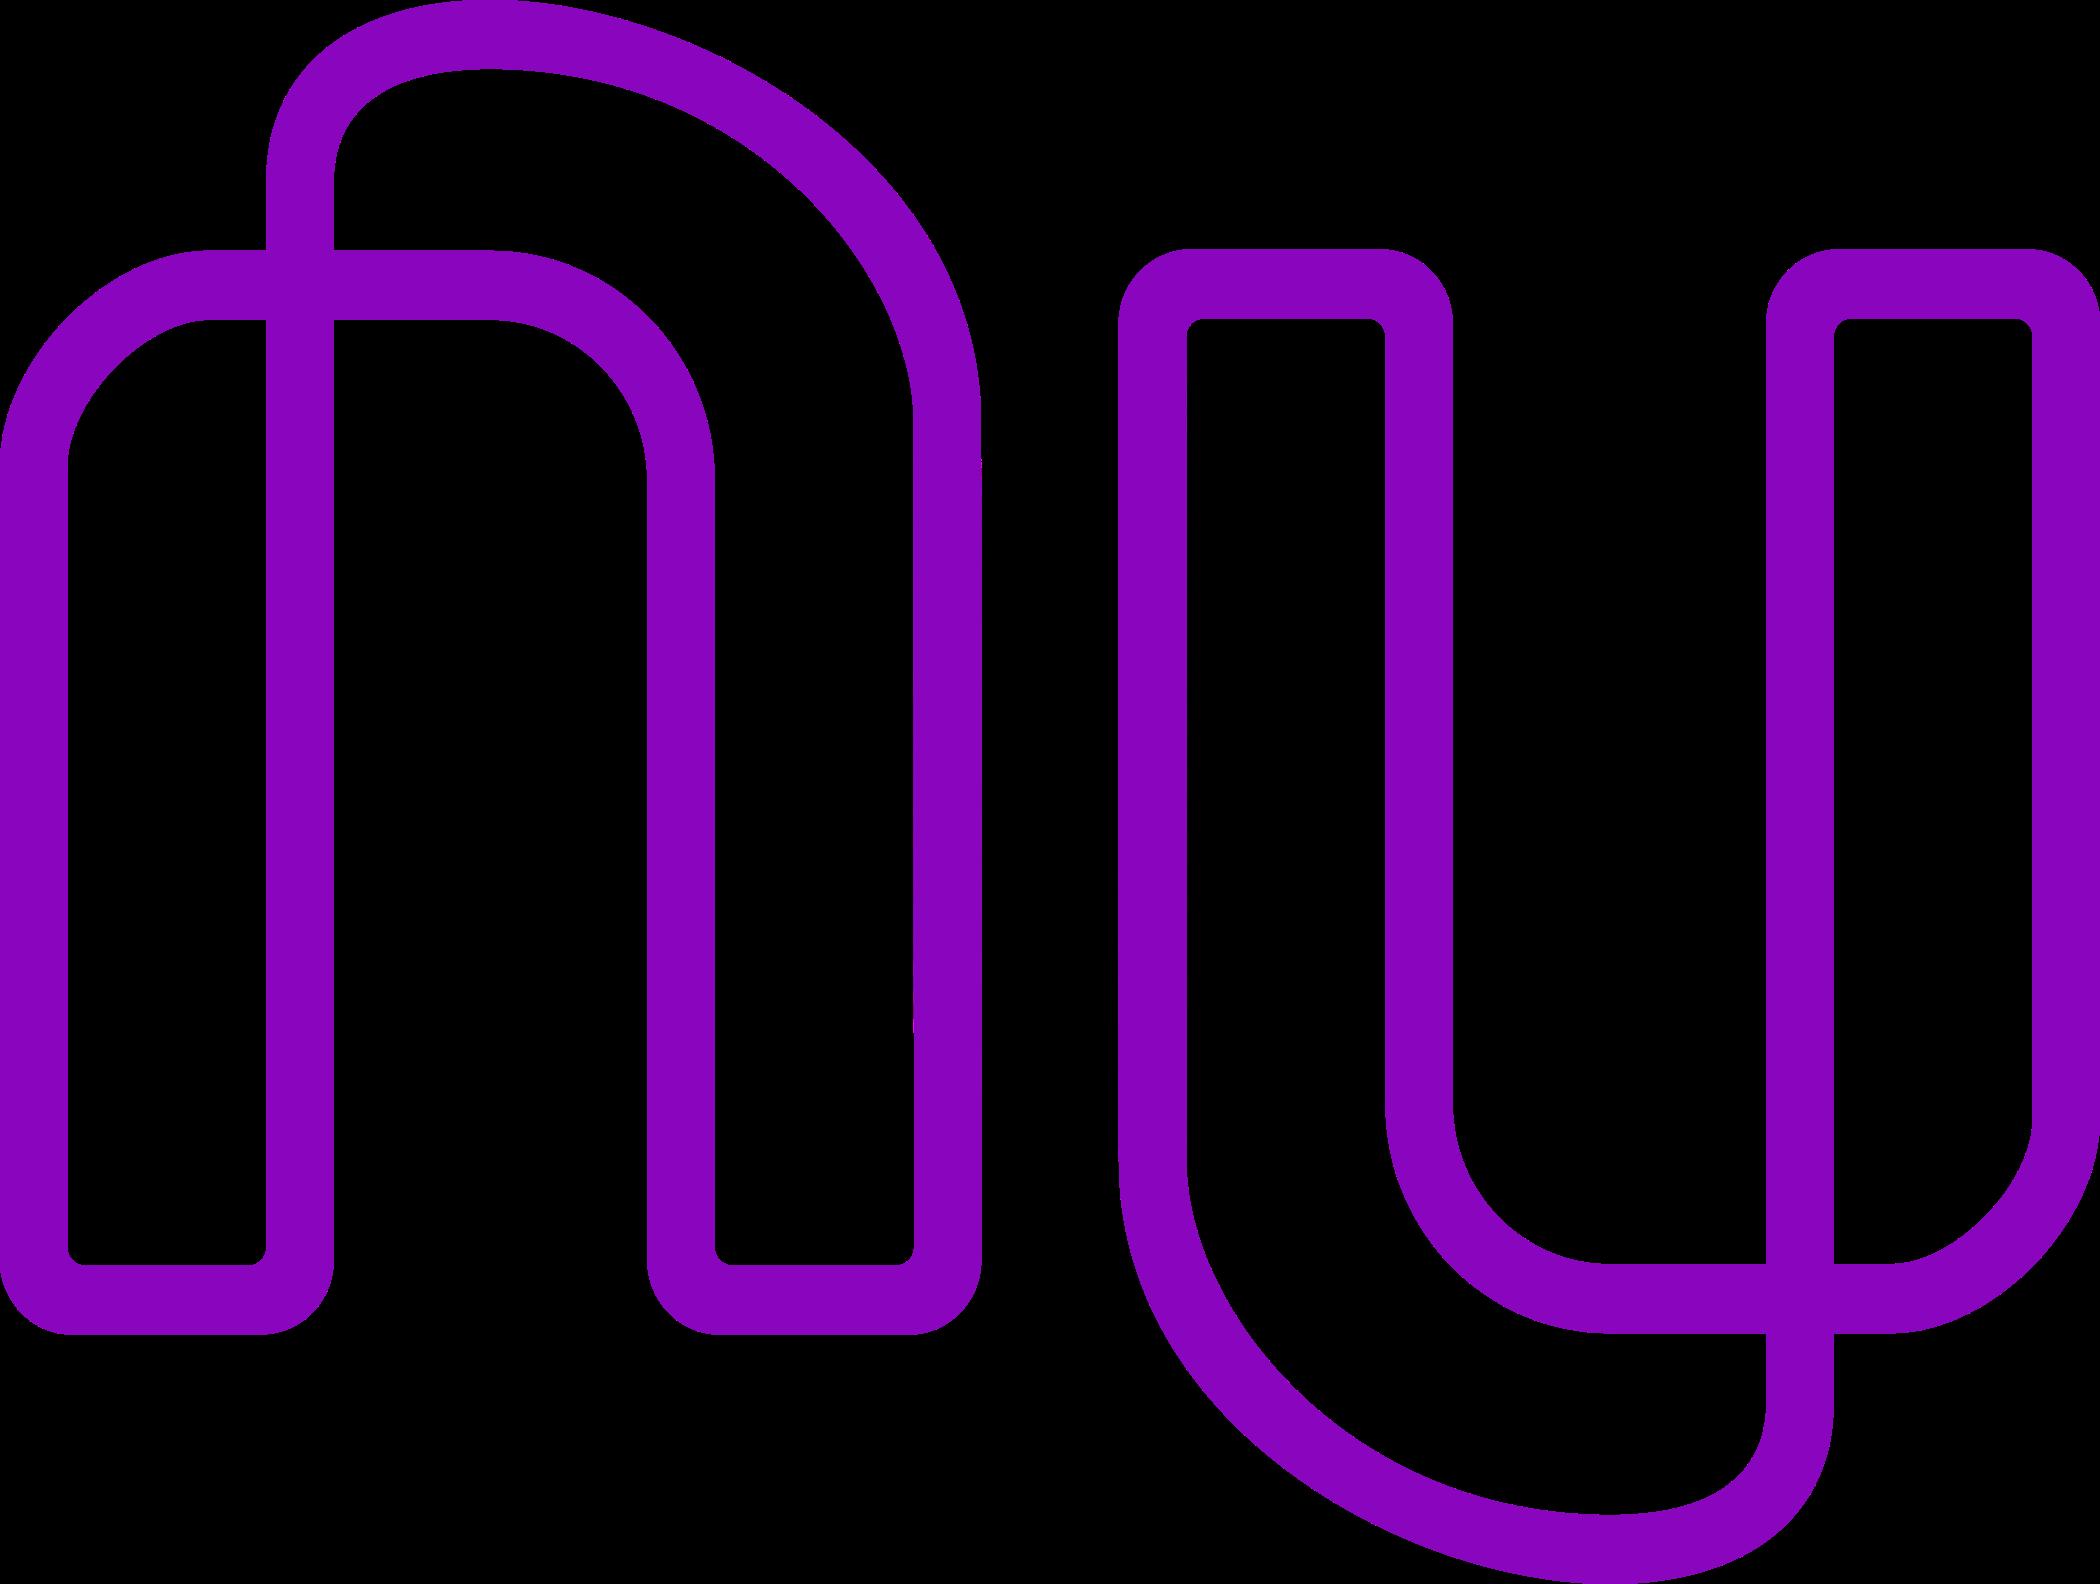 nubank logo 7 - Nubank Logo